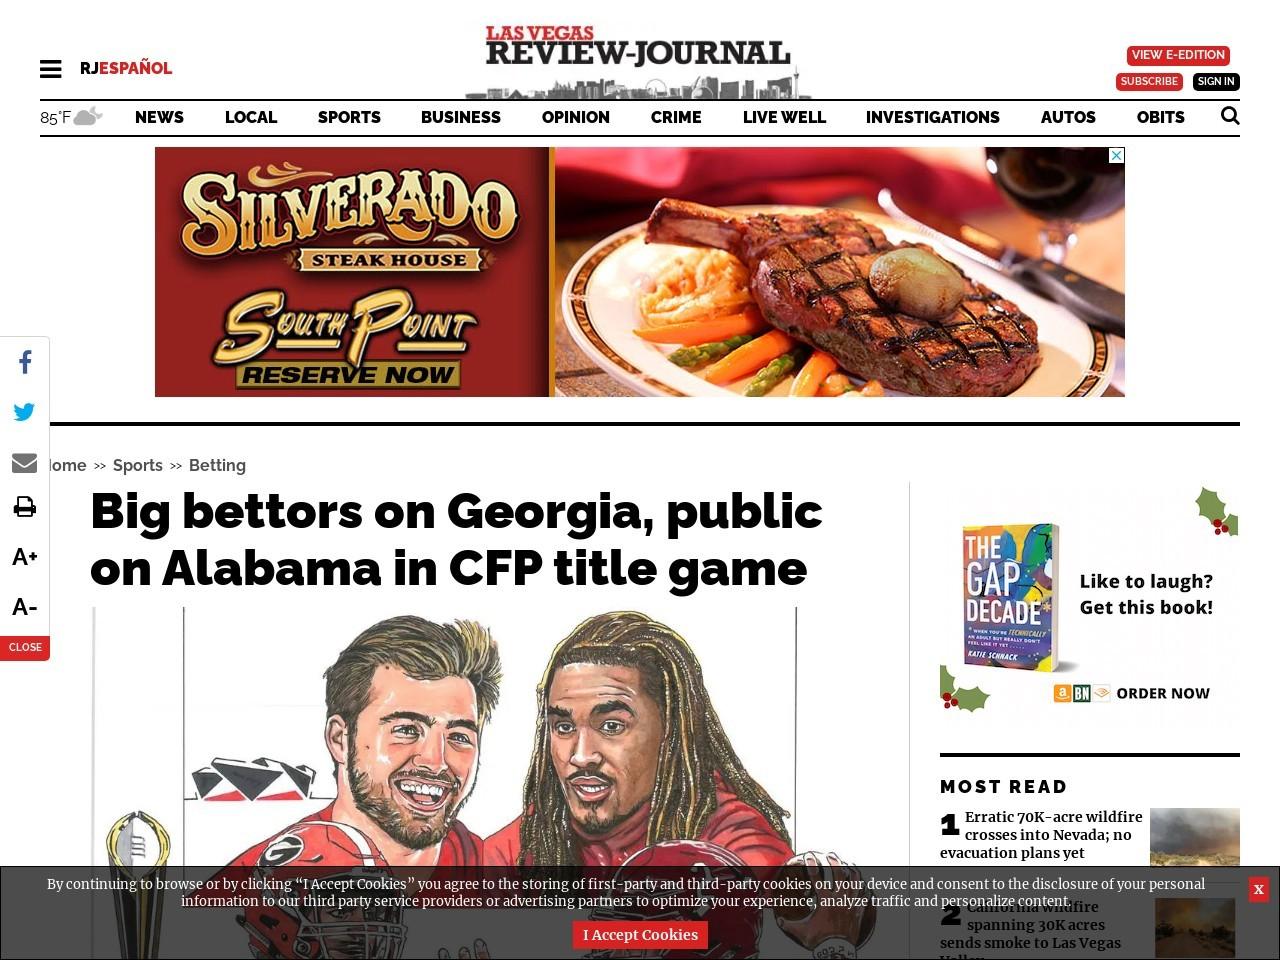 Big bettors on Georgia, public on Alabama in CFP title game